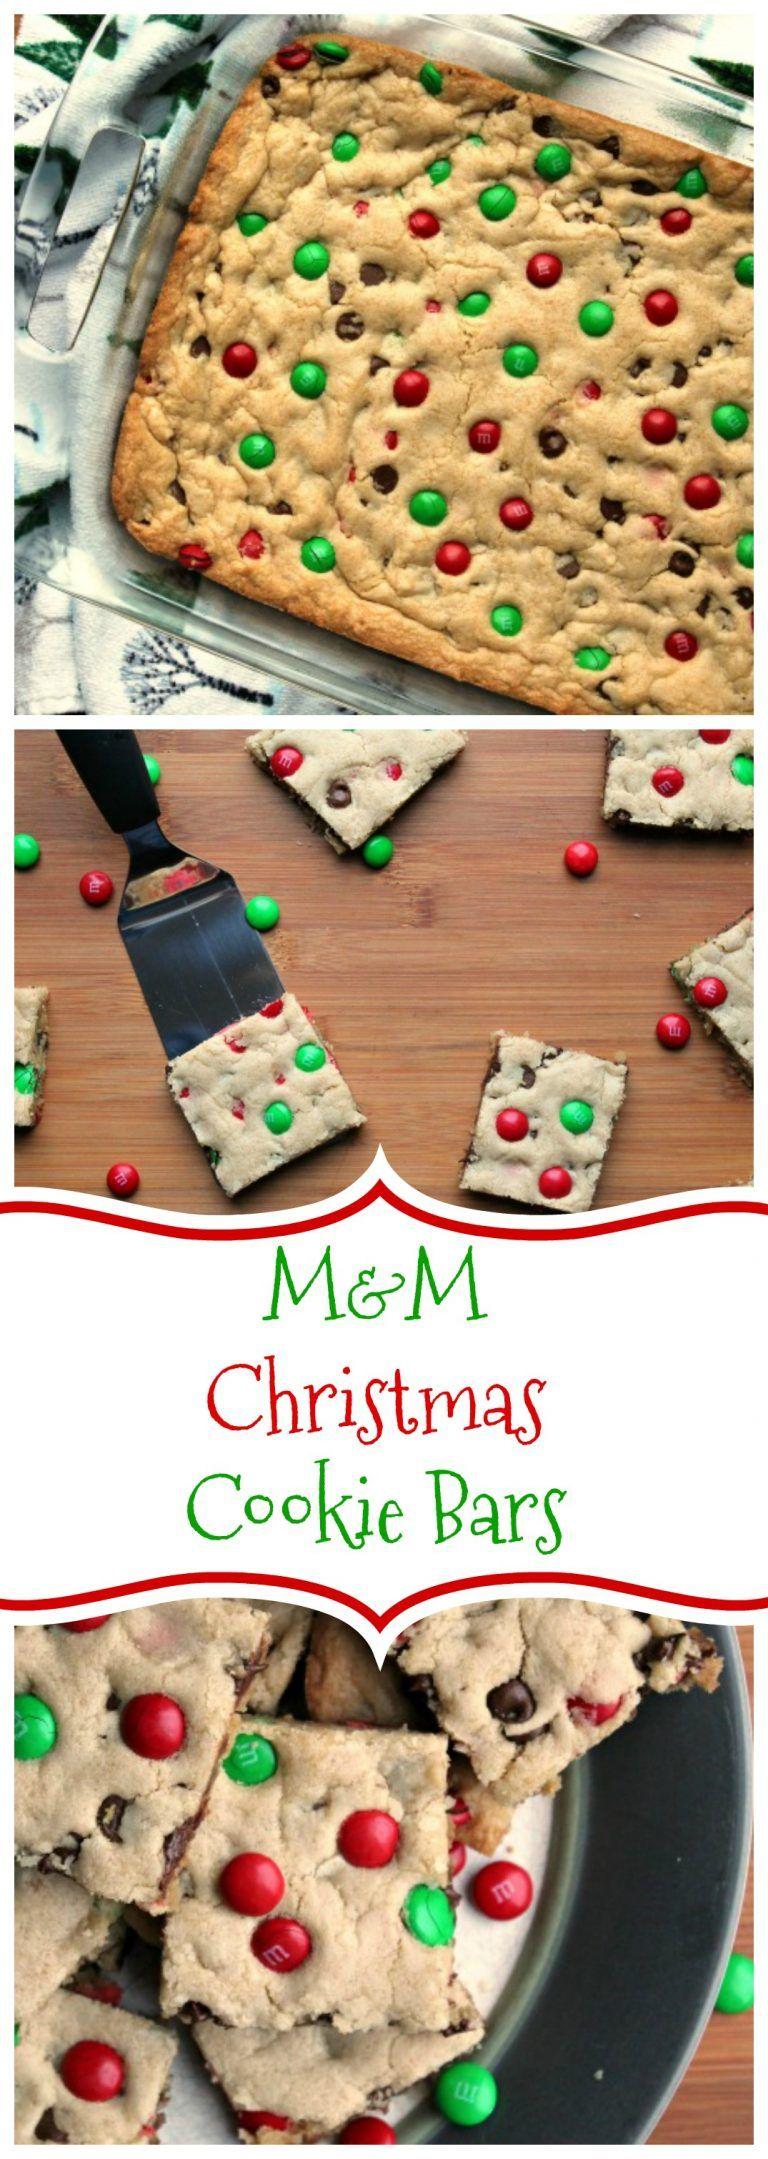 M&M Christmas Cookie Bars - Foody Schmoody Blog